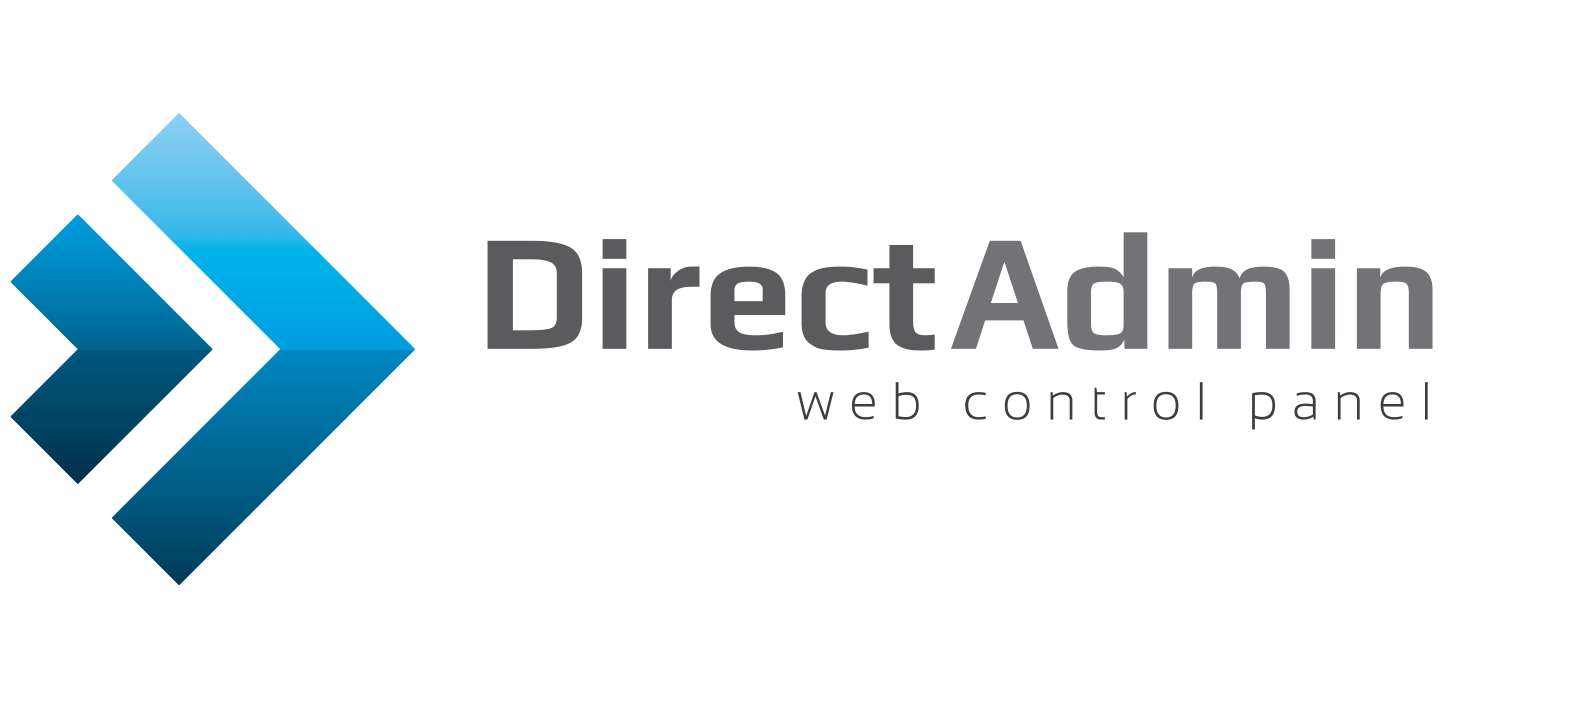 DirectAdmin Max Username Length